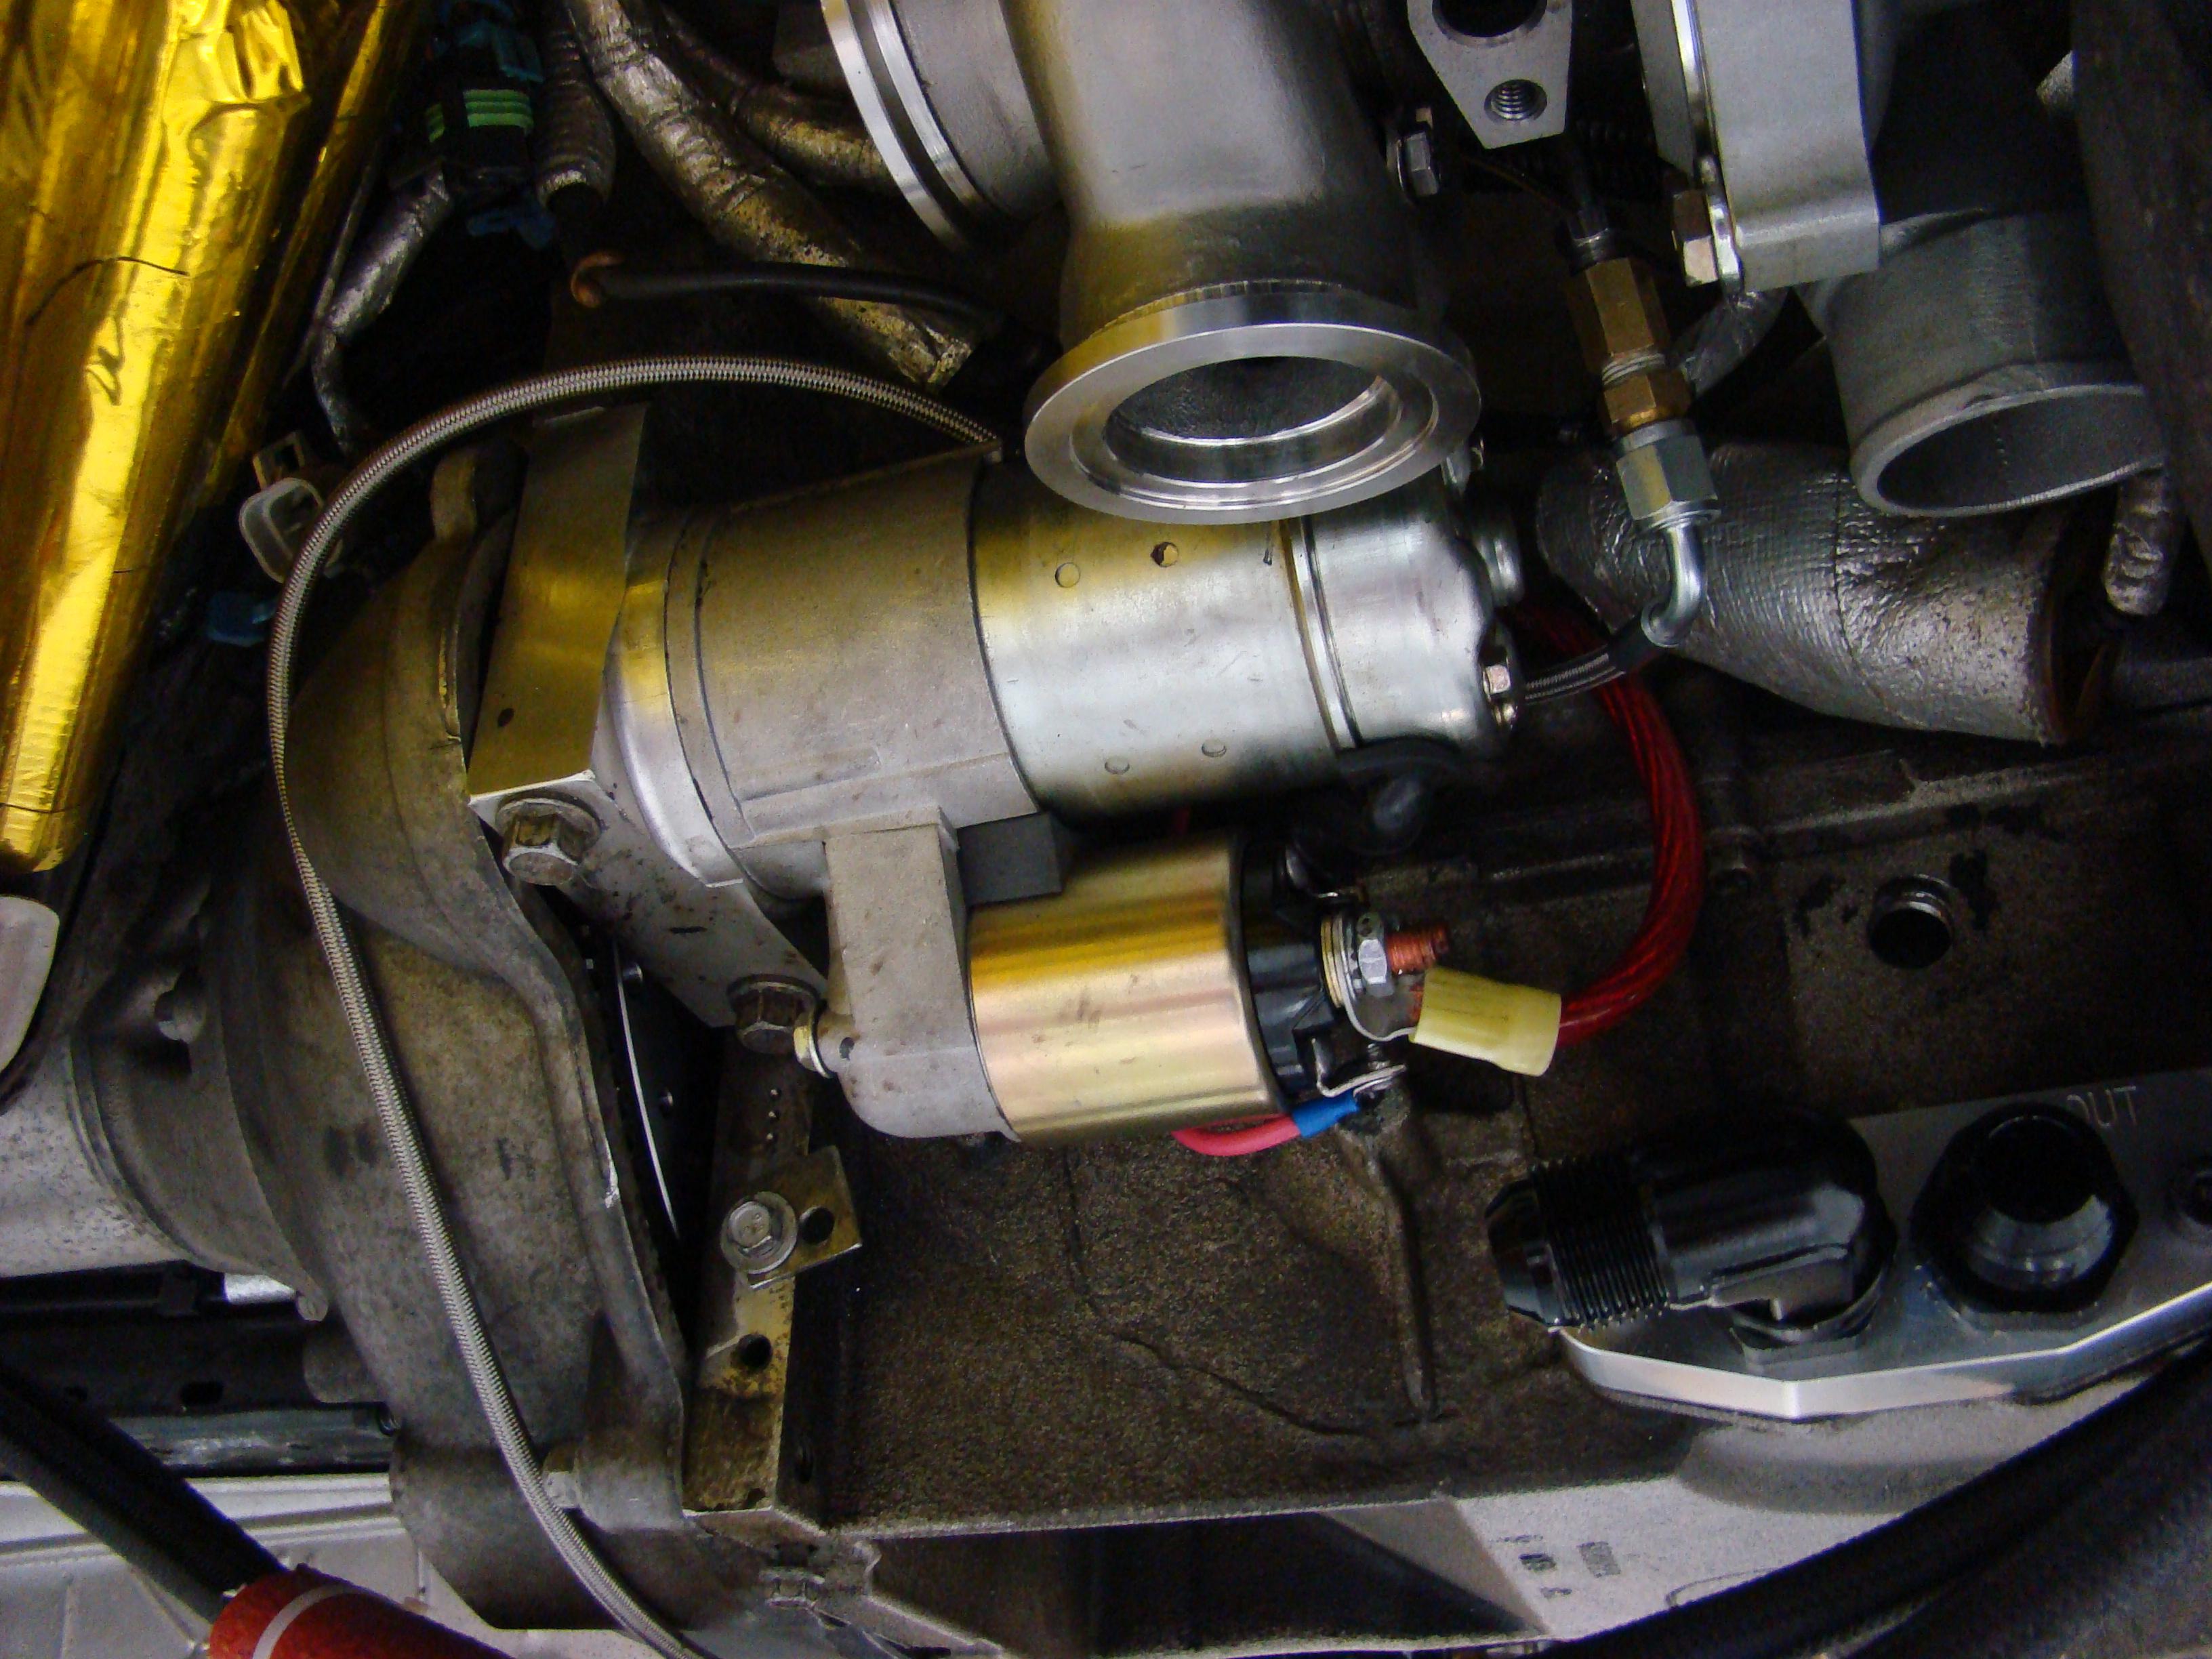 1990 Gmc Starter Wiring Diagram 2005 2013 Corvette C6 Amp C6 Z06 Twin Turbo System